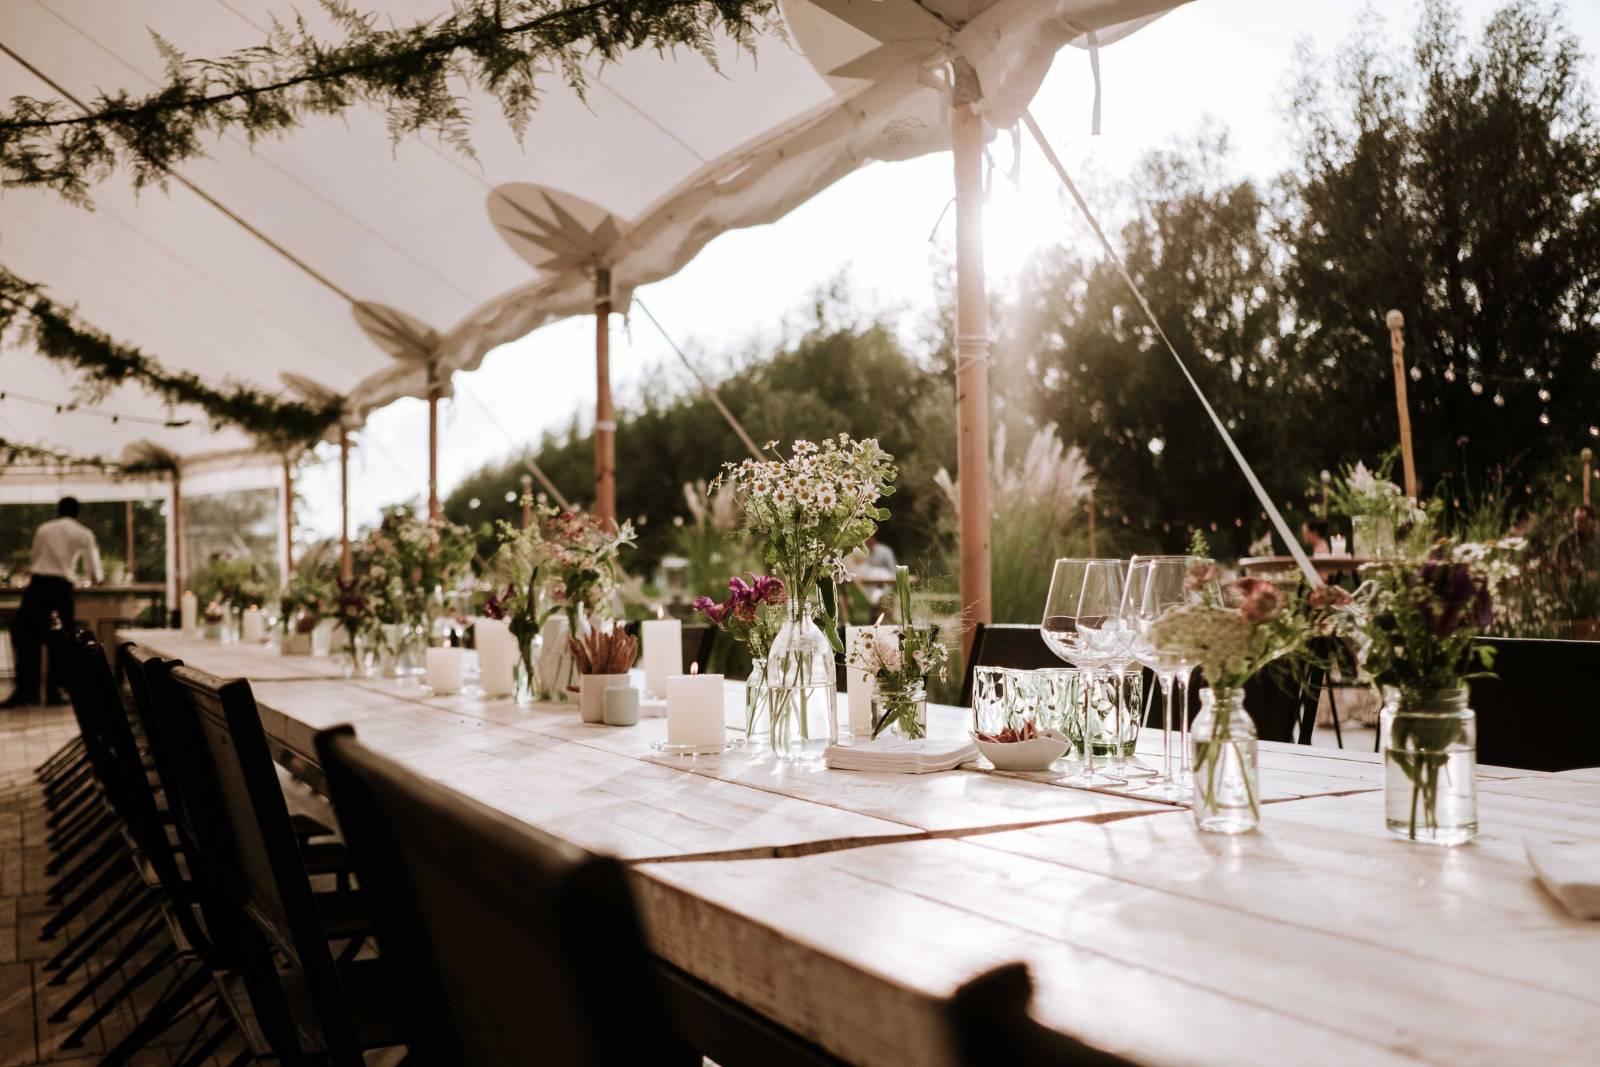 Panache Events - Wedding Planner - House of Weddings 2